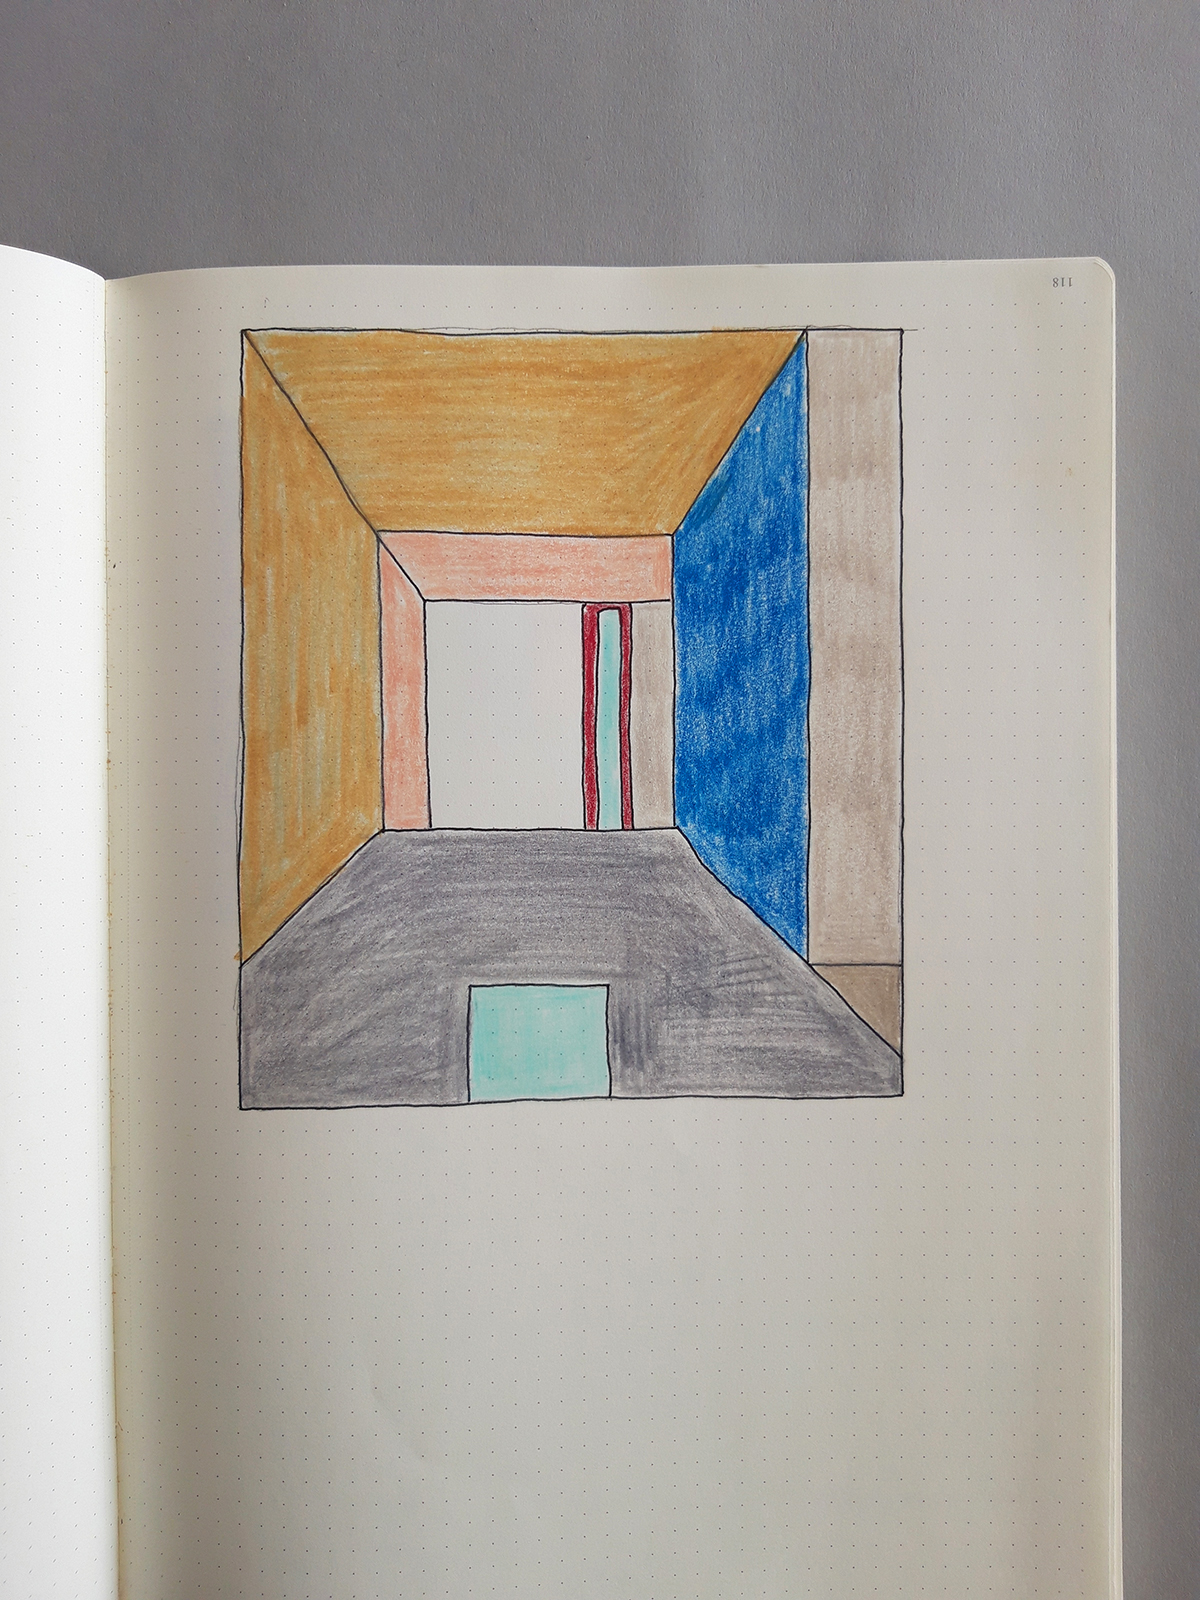 Eleanor_Pritchard_Fallingwater_drawing_1a.jpg